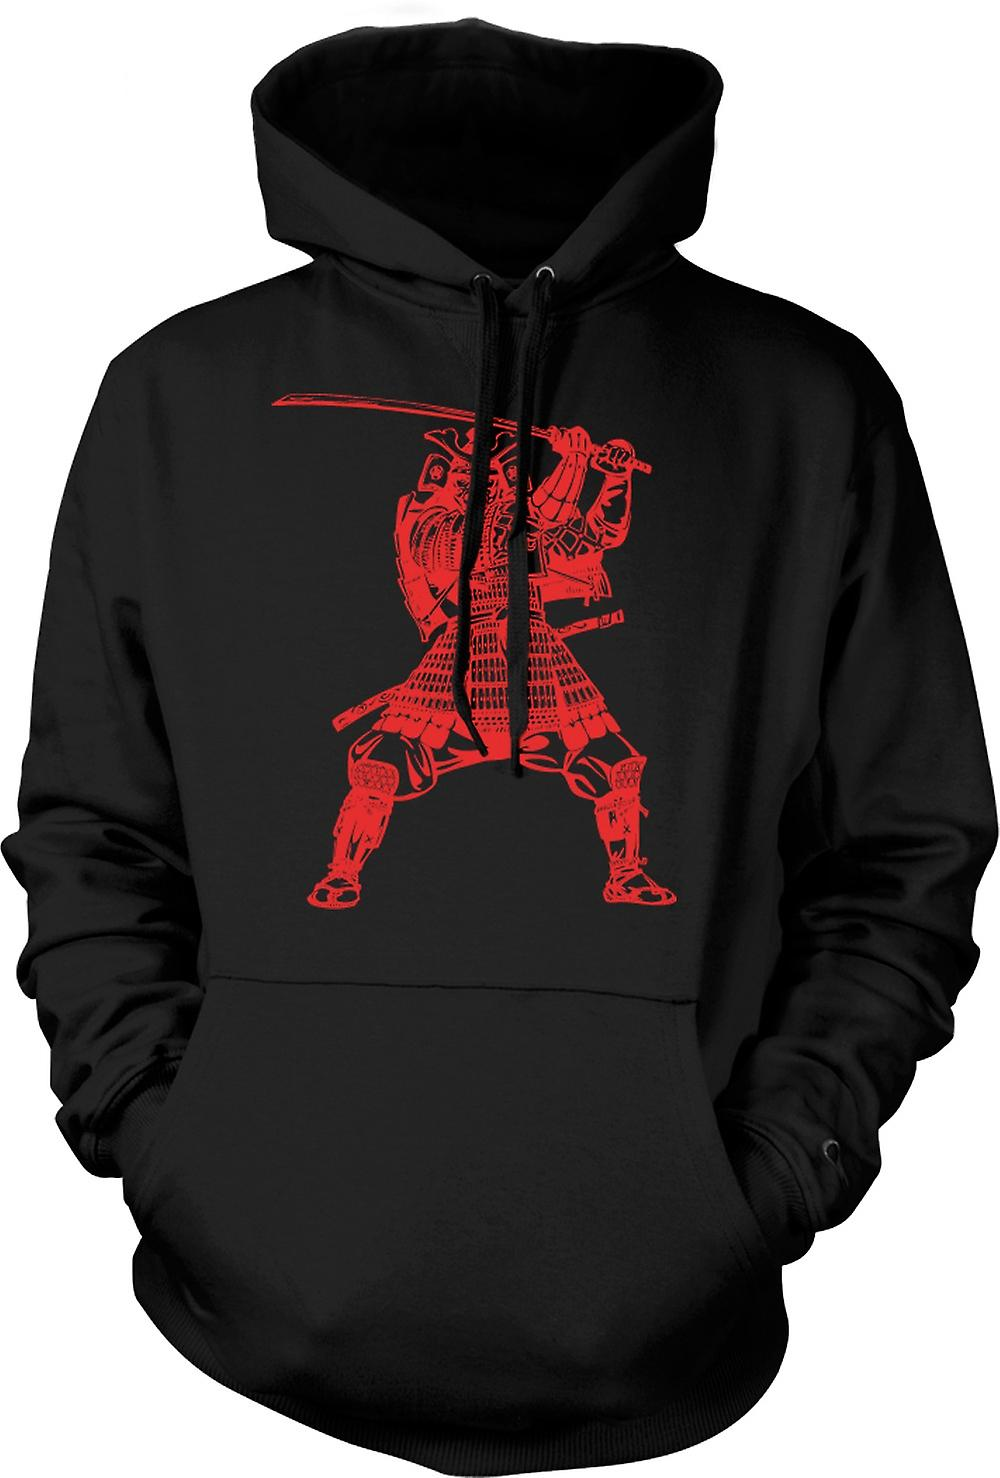 Mens Hoodie - Samurai Warrior